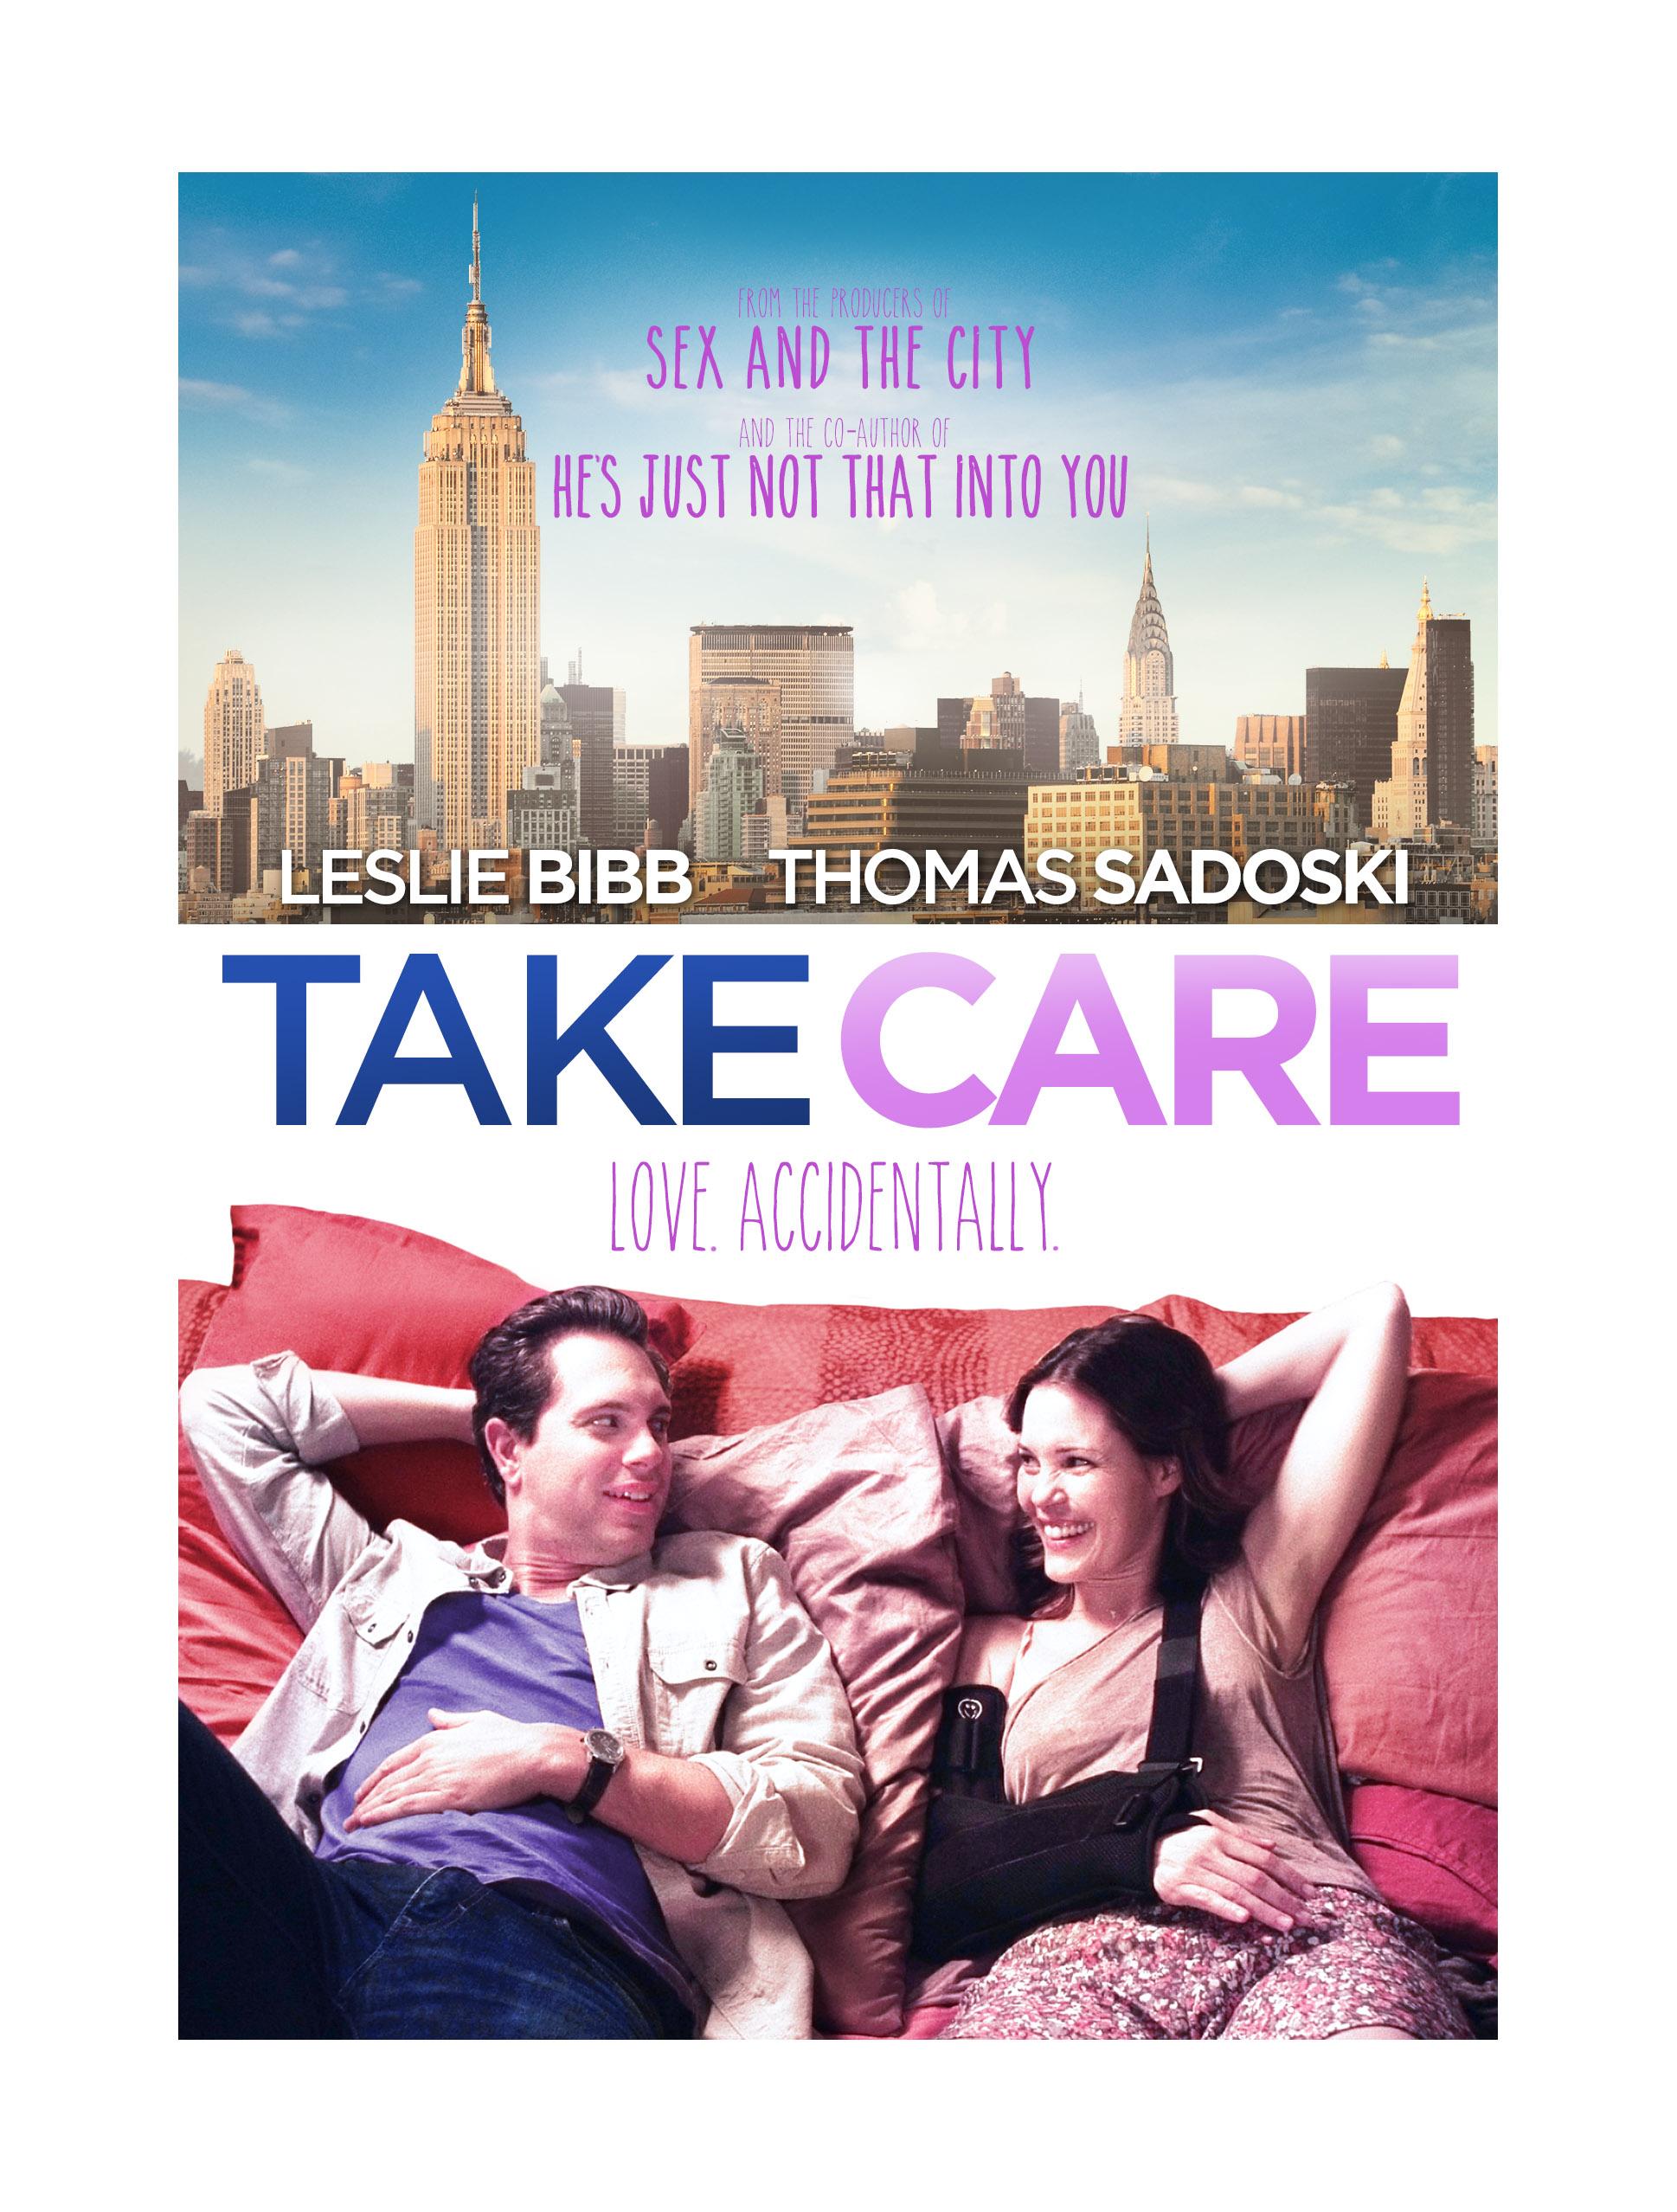 Take Care 2014 IMDb